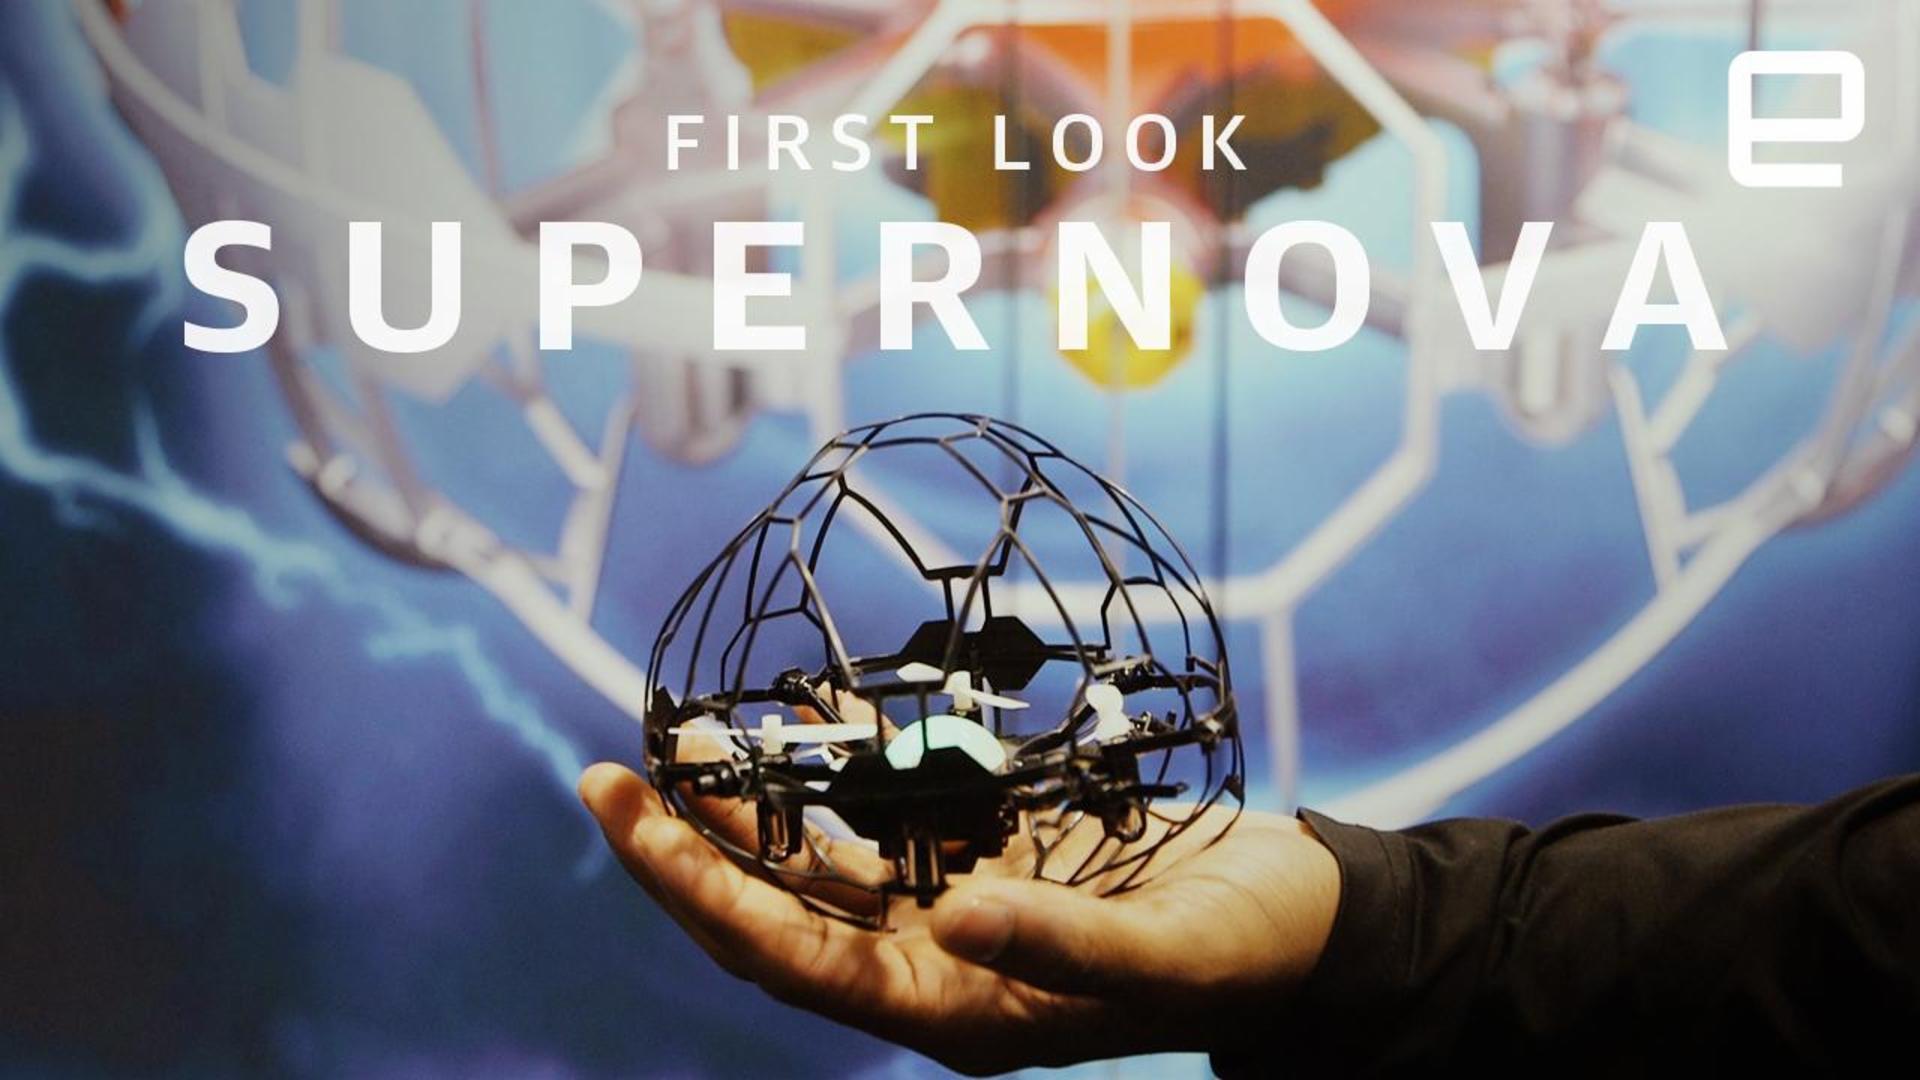 Air Hogs' Supernova packs motion controls in a kid-friendly drone